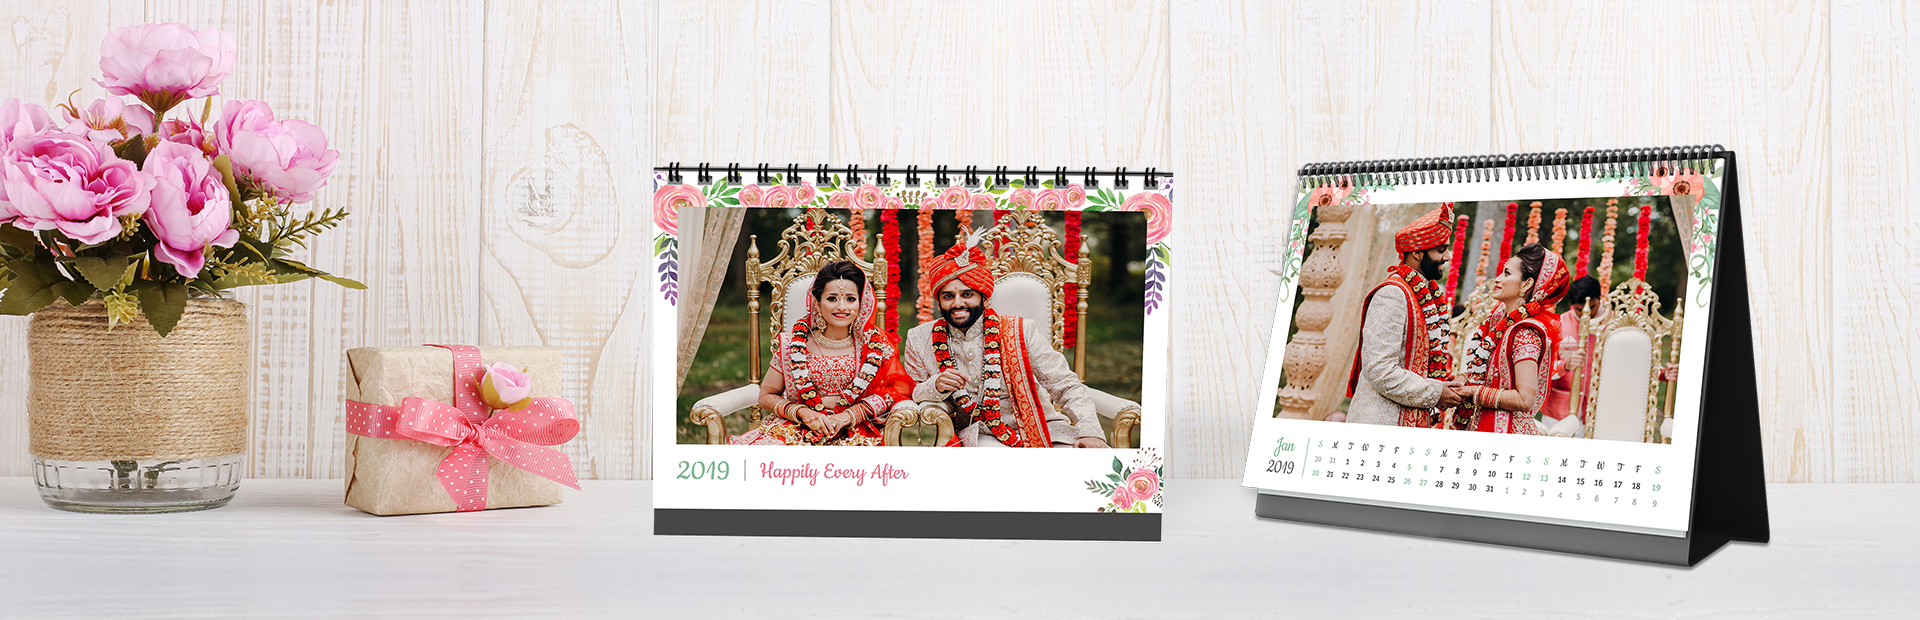 Wondrous Wedding Photo Calendars Online